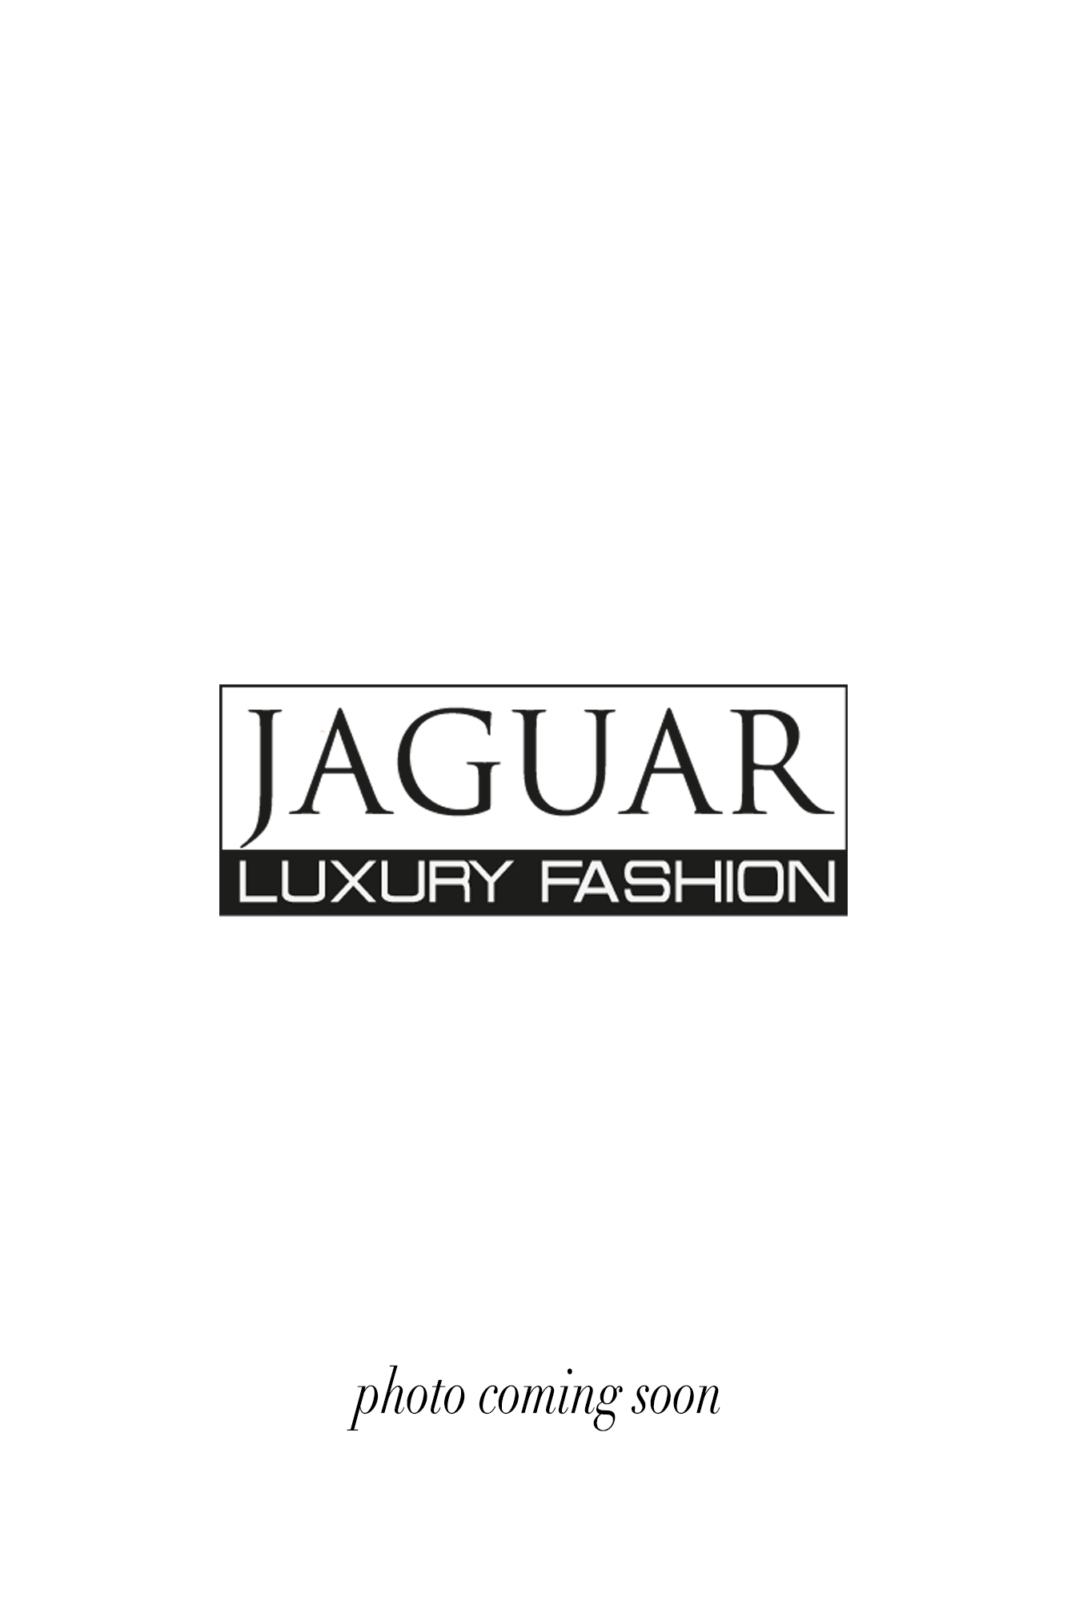 Jaguar Mode